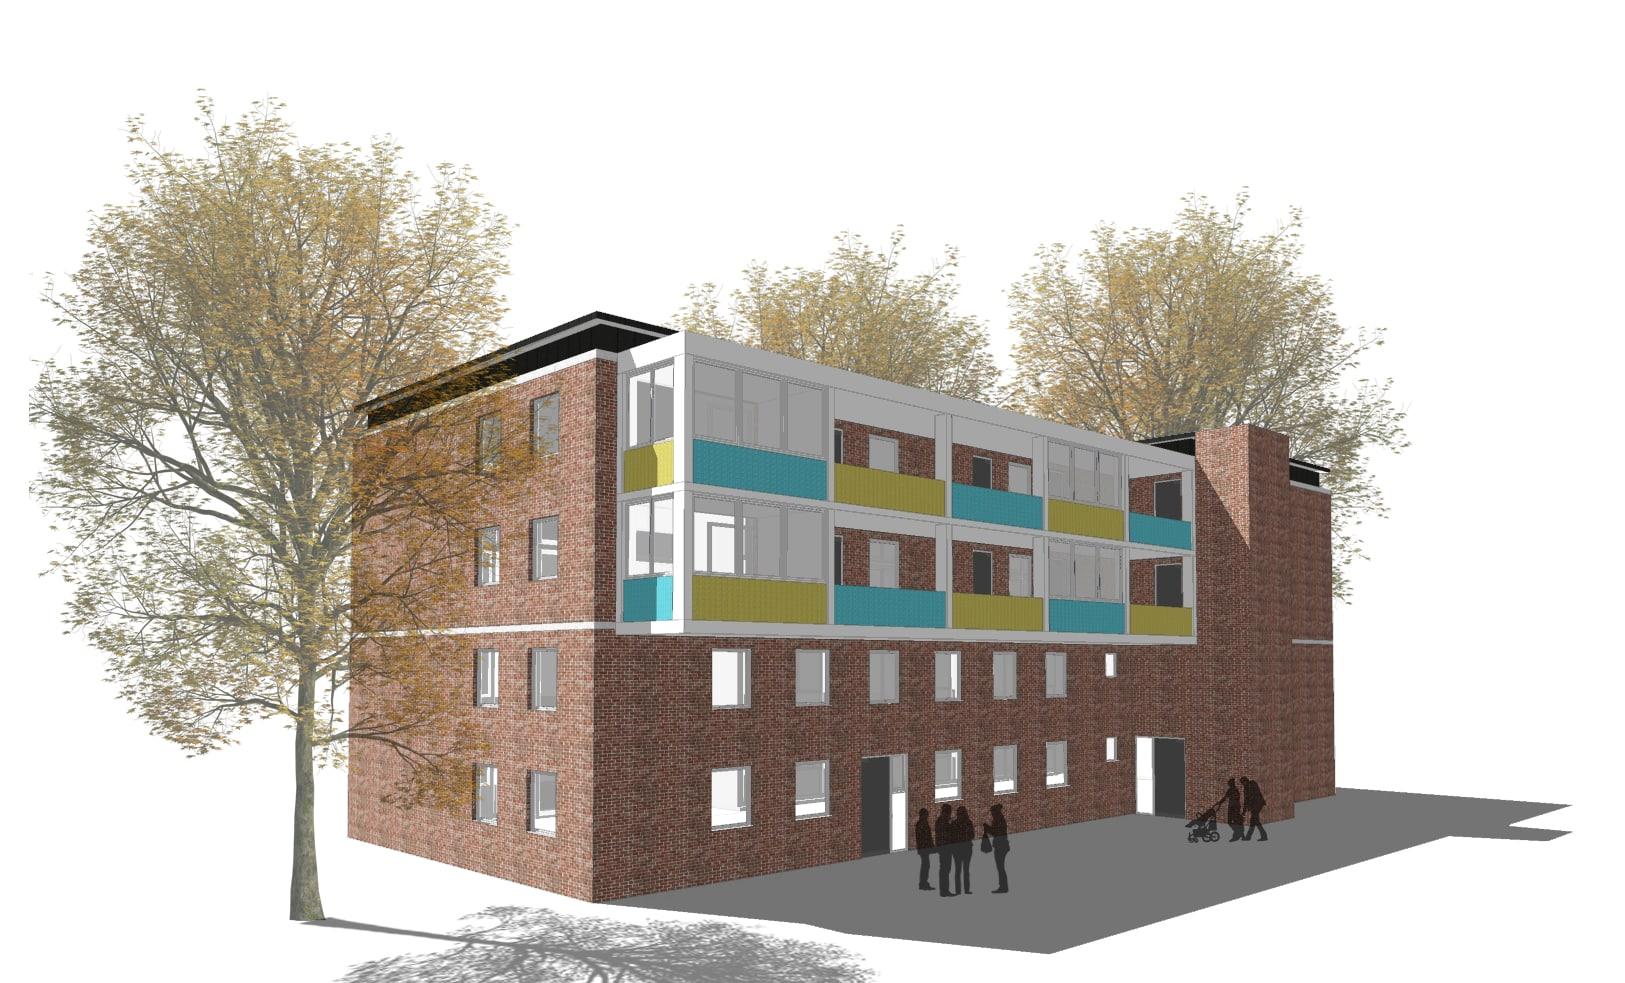 Stephanstrasse48 - ein Wentzel Dr. Neubauprojekt